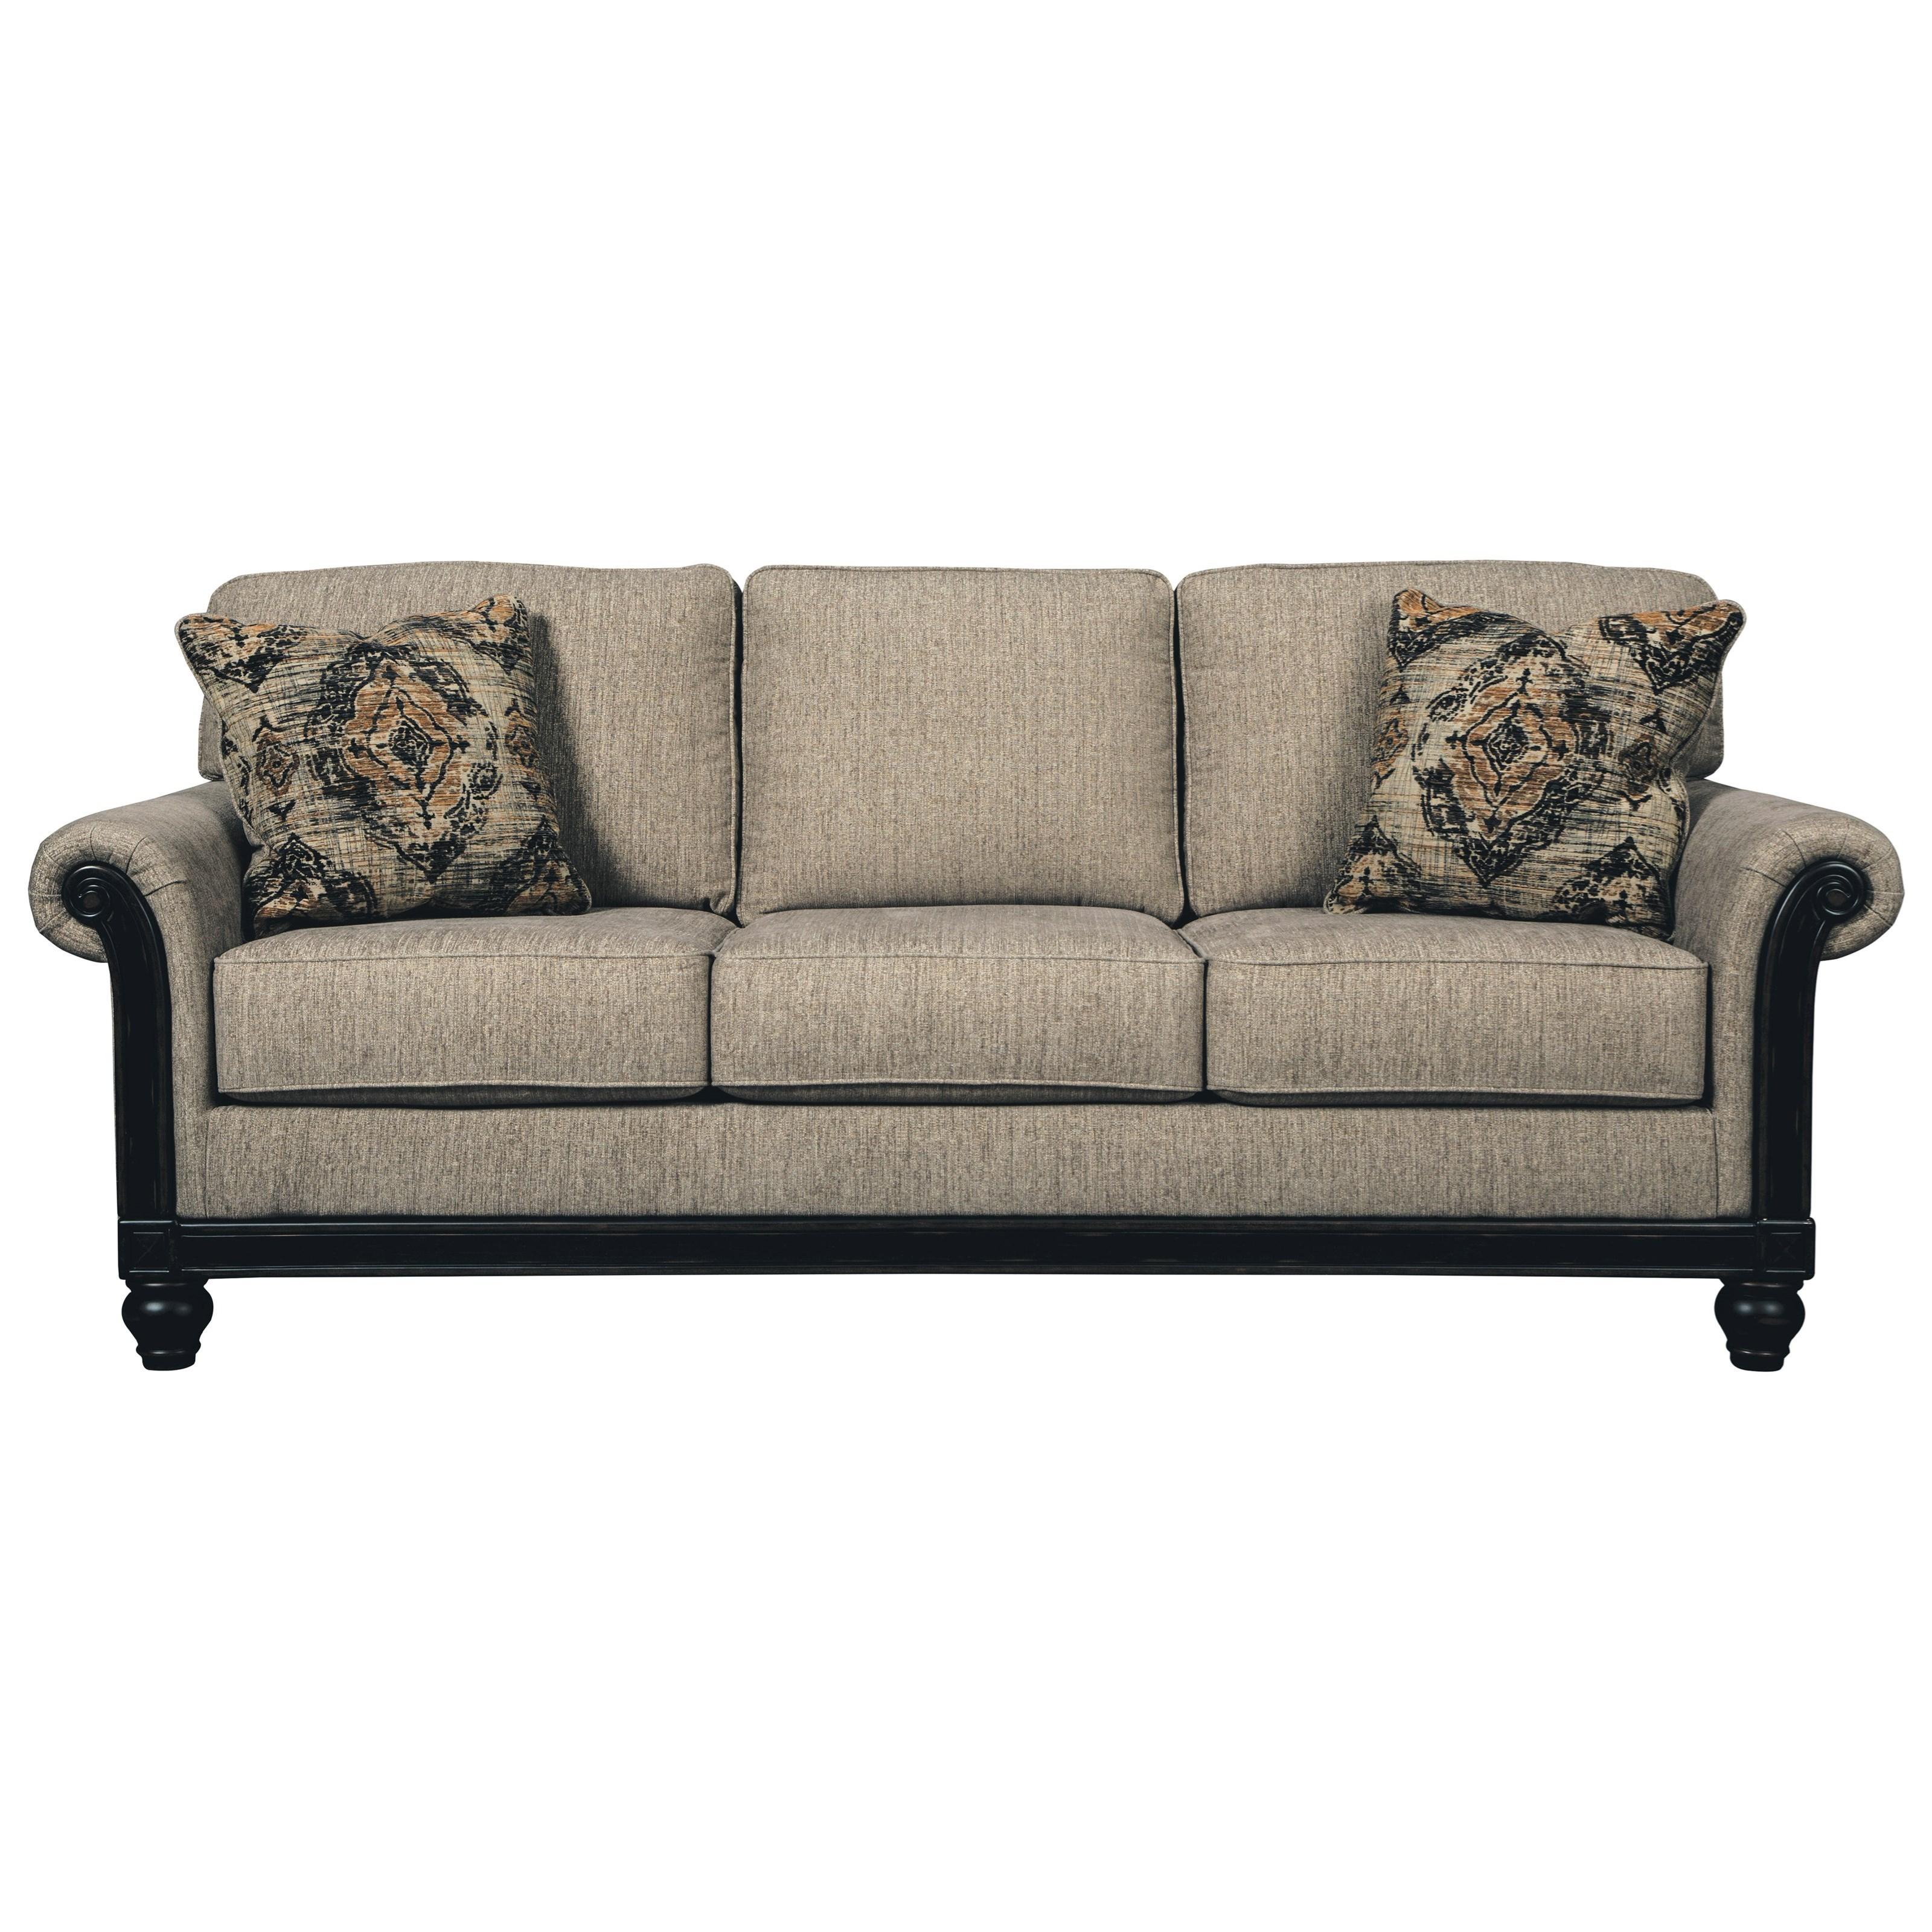 signature design by ashley blackwood transtional queen sofa sleeper with memory foam mattress - Queen Sofa Sleeper